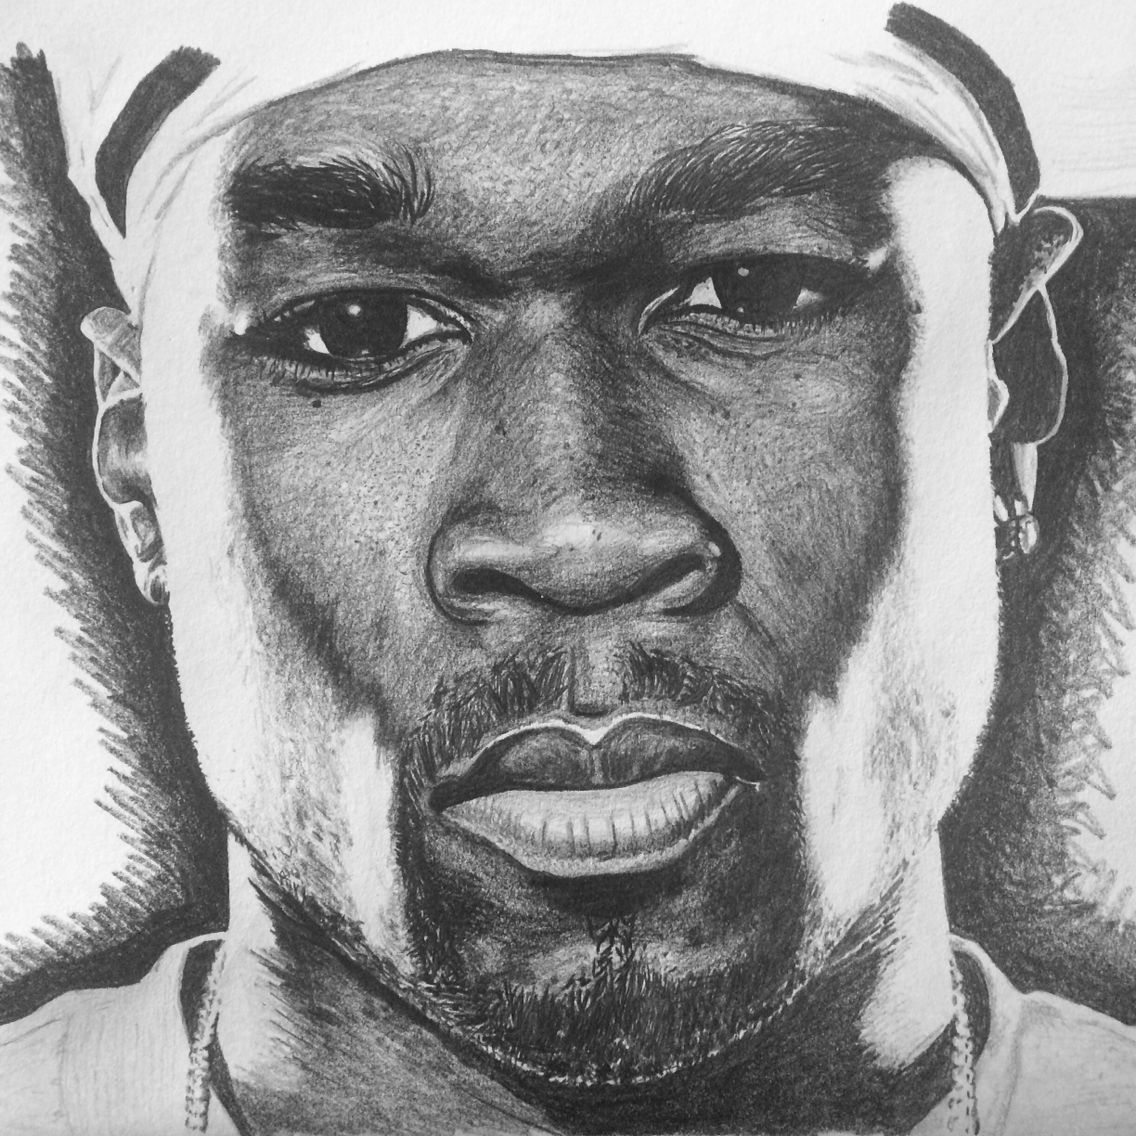 50 Cent Coloring Sheet Dibujos Para Colorear Maestra De